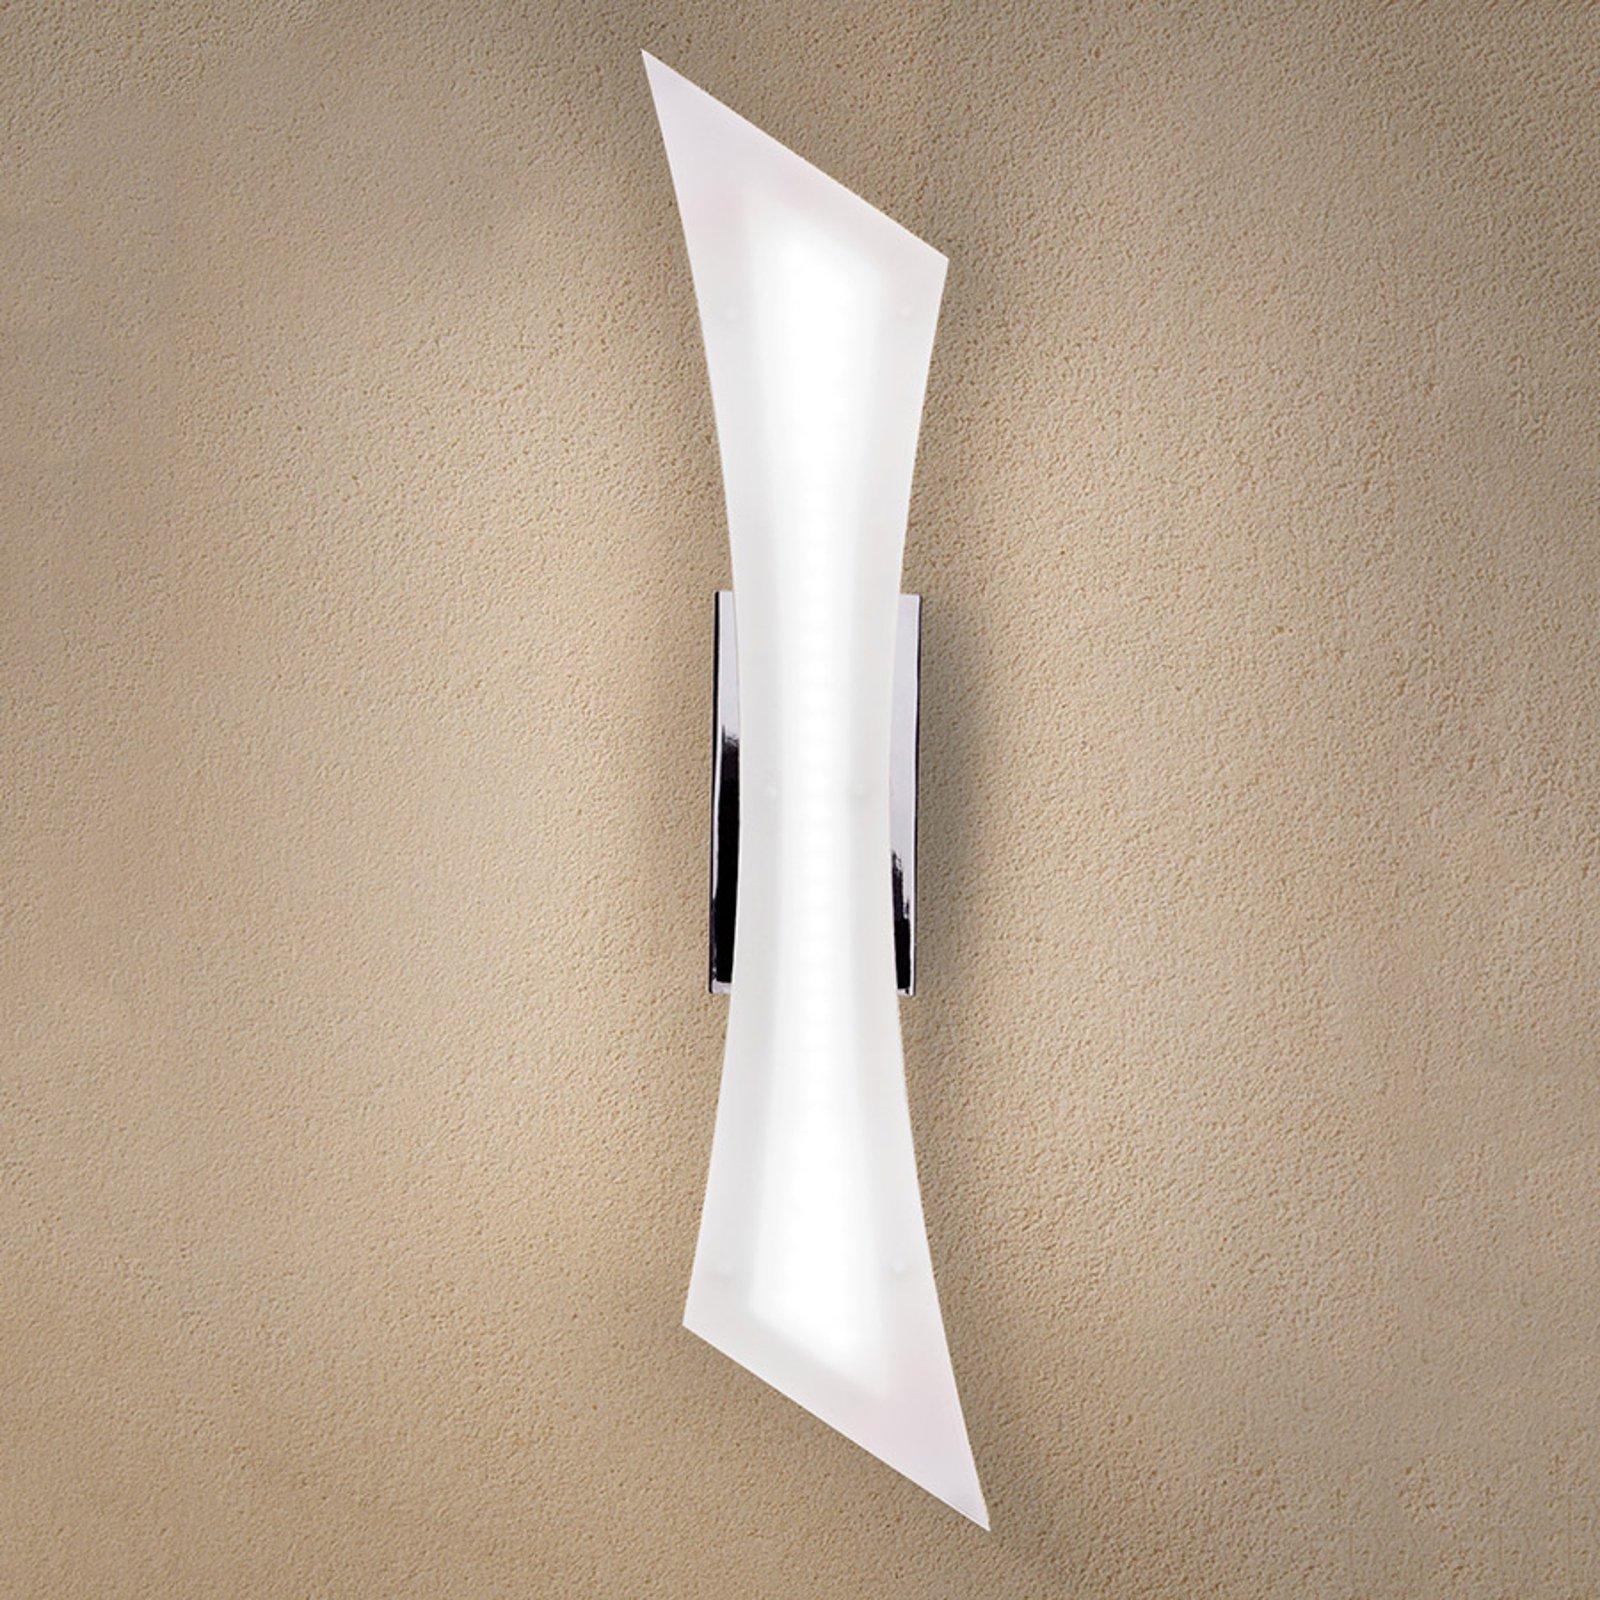 Tiltalende LED-vegglampe Dilara